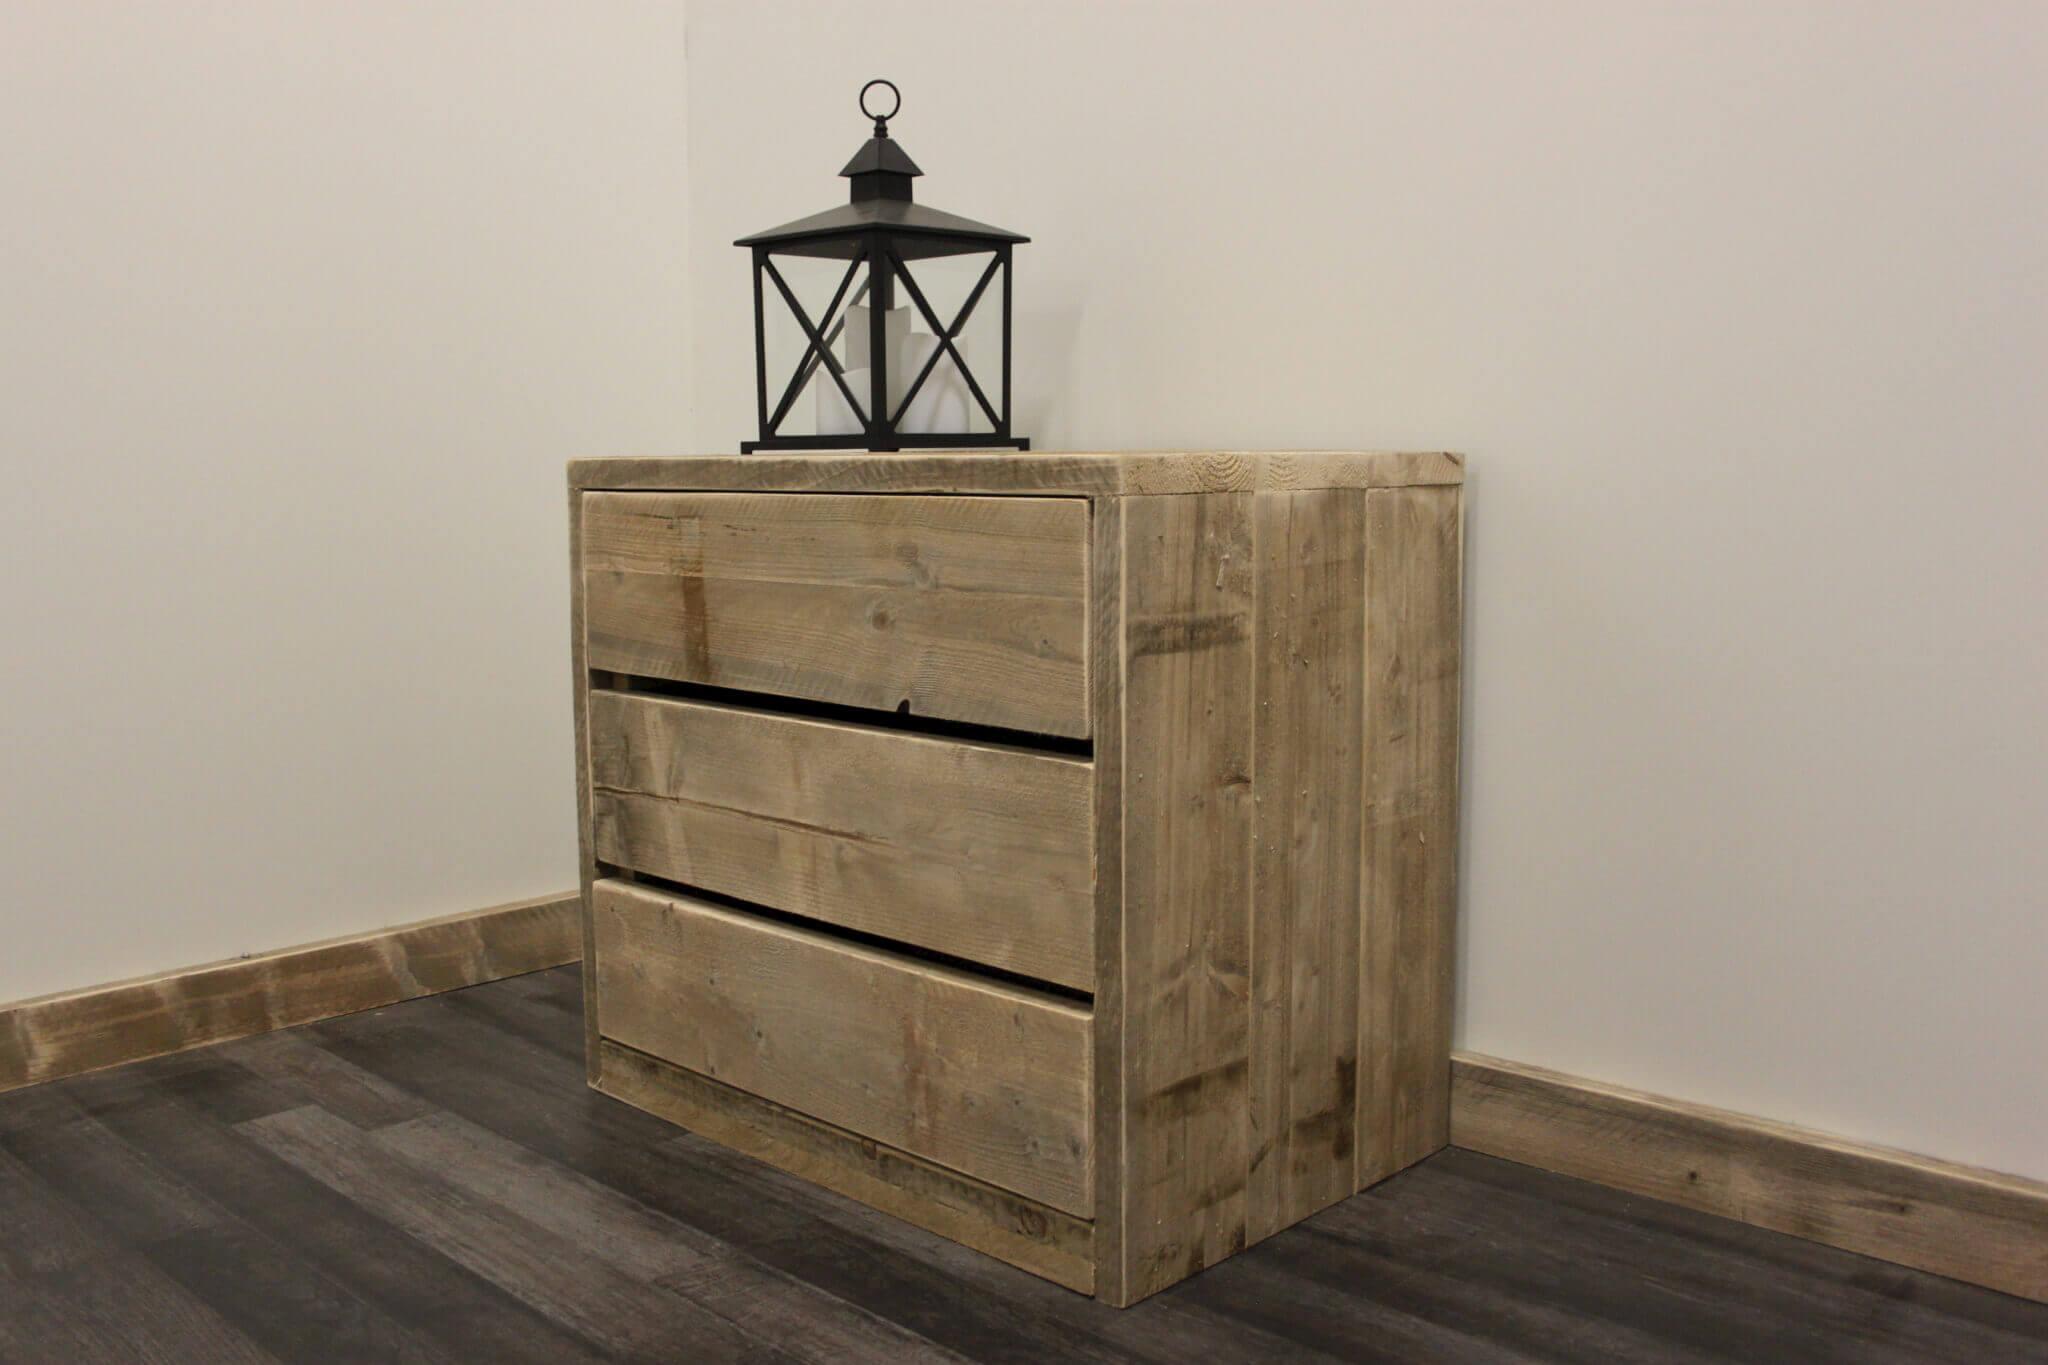 Badkamer ladekast narciso chest of drawers cantori arenascollection nl funvit keukenkast - Keukenkast outs ...